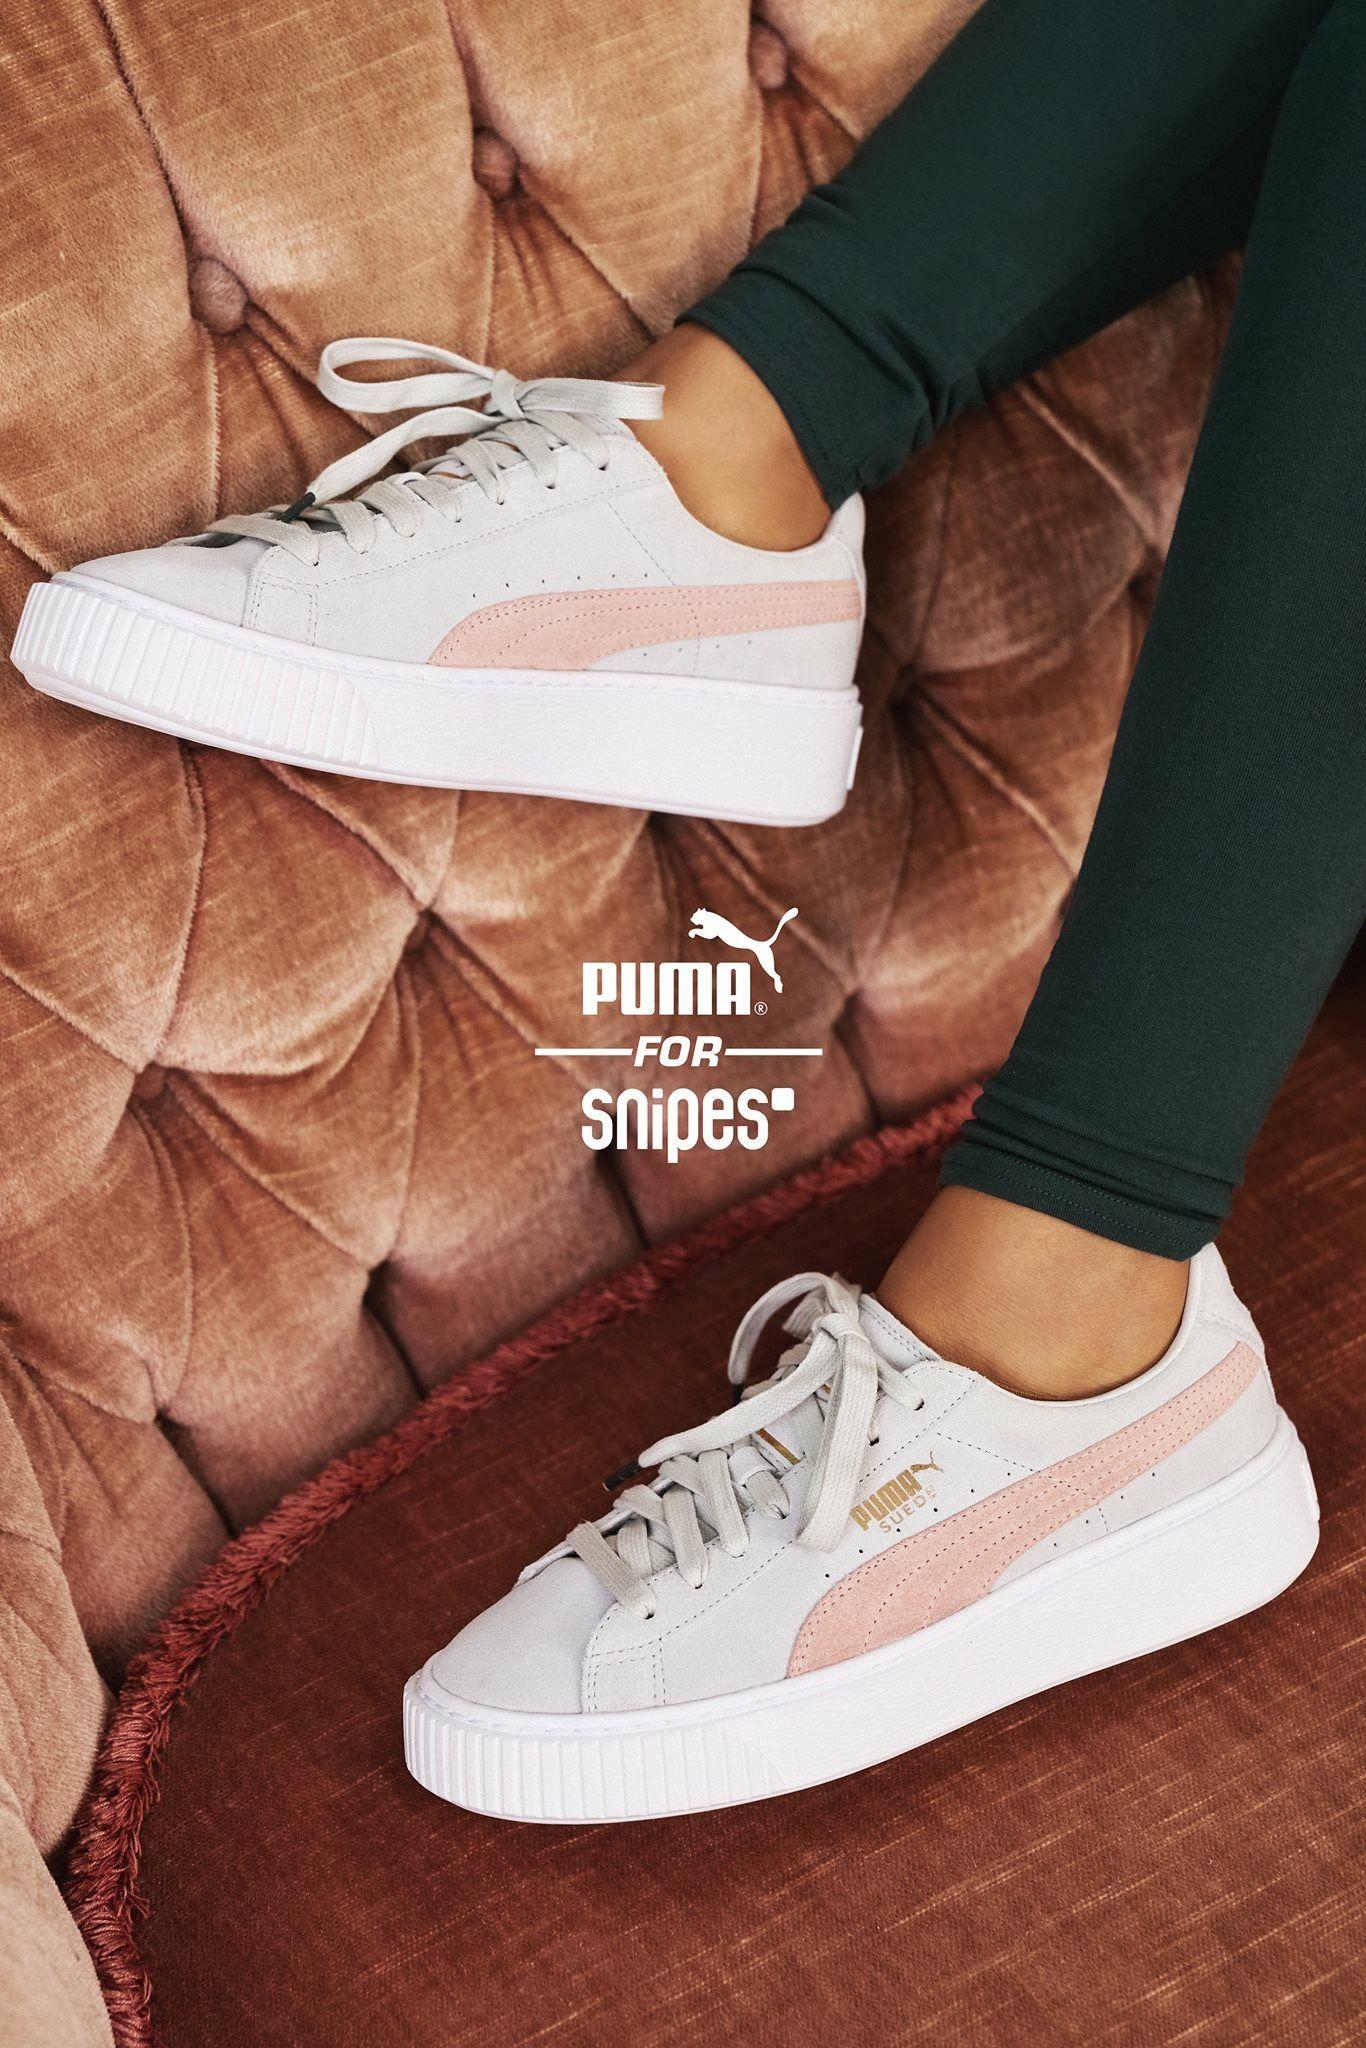 Pin de S. B. em Sneaker | Tenis sapato, Tênis feminino